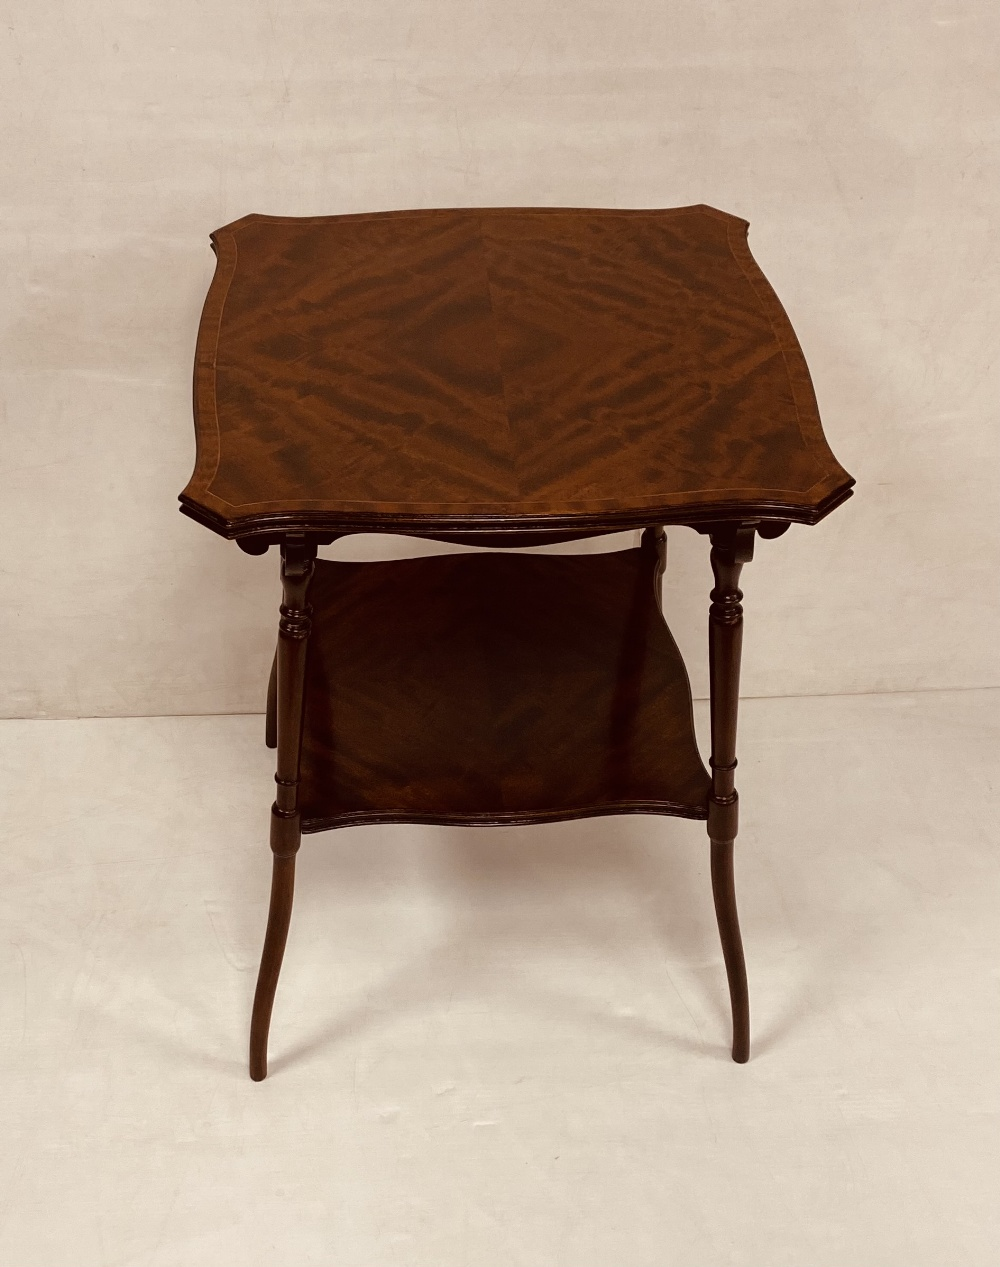 Very Clean Edw Inlaid Mahogany 2 Tier Side Table 50 cm Sq x 68cm H